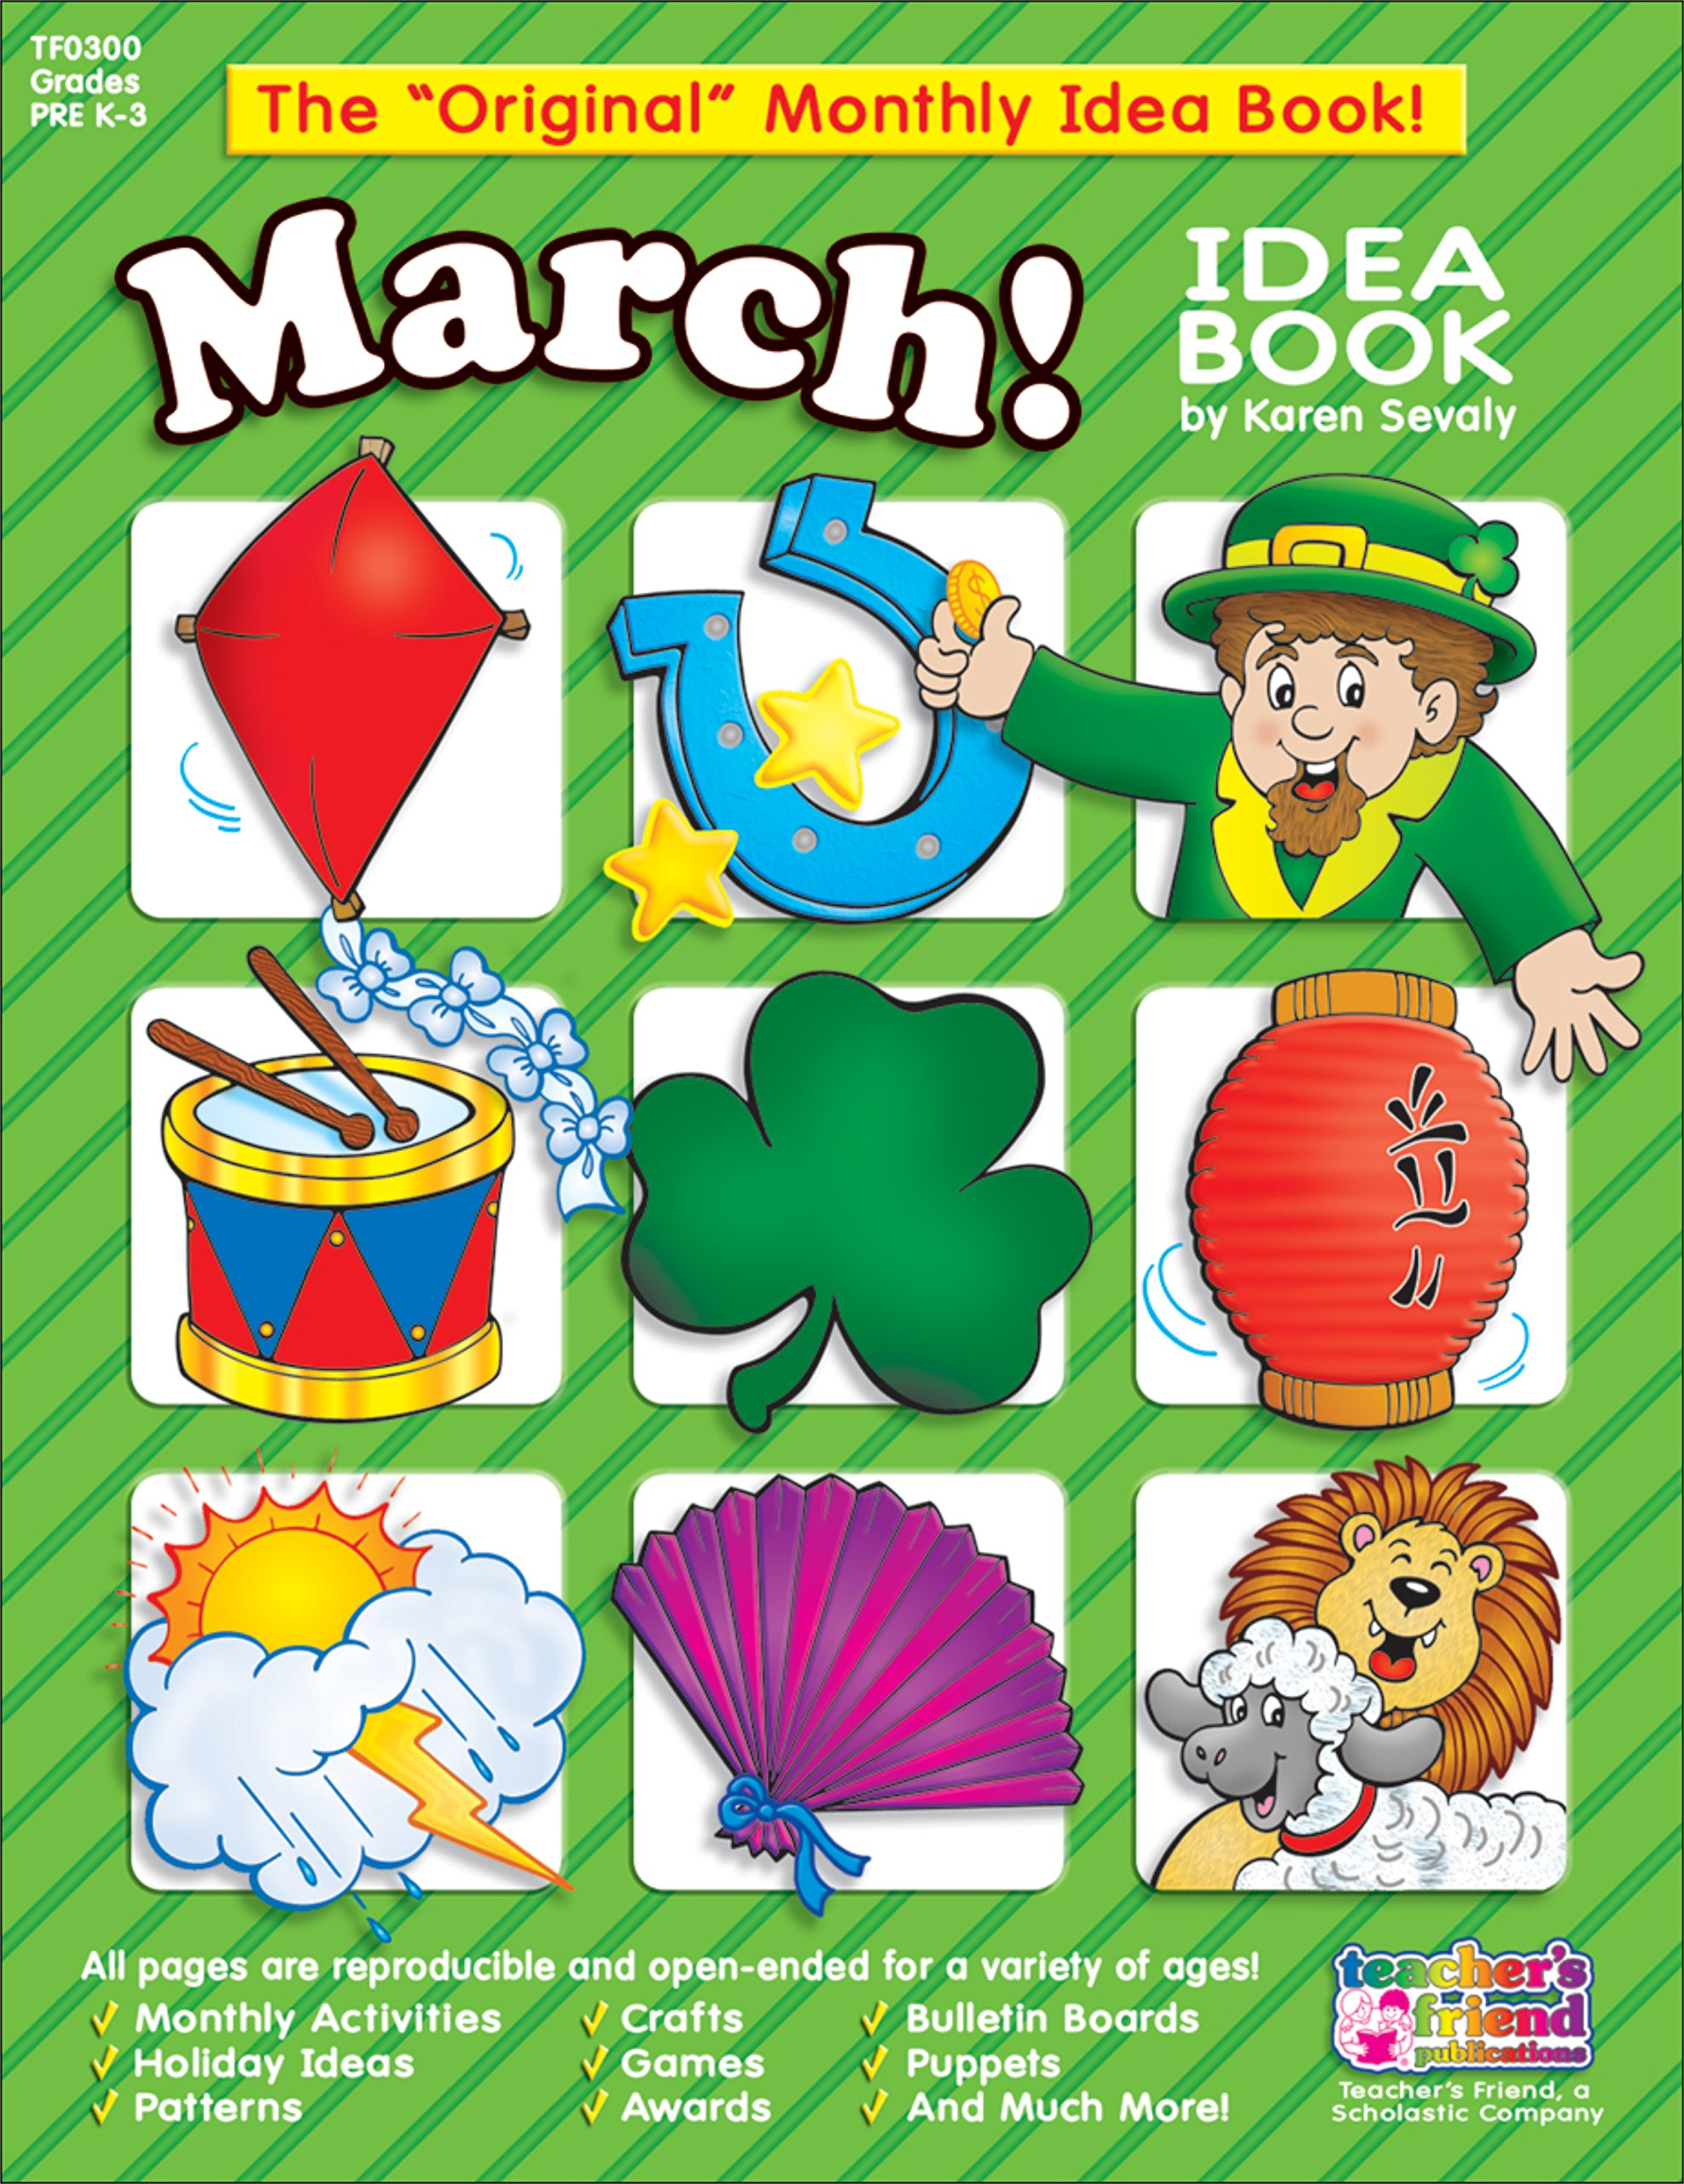 march monthly idea book scholastic 0031095003003 amazon com books